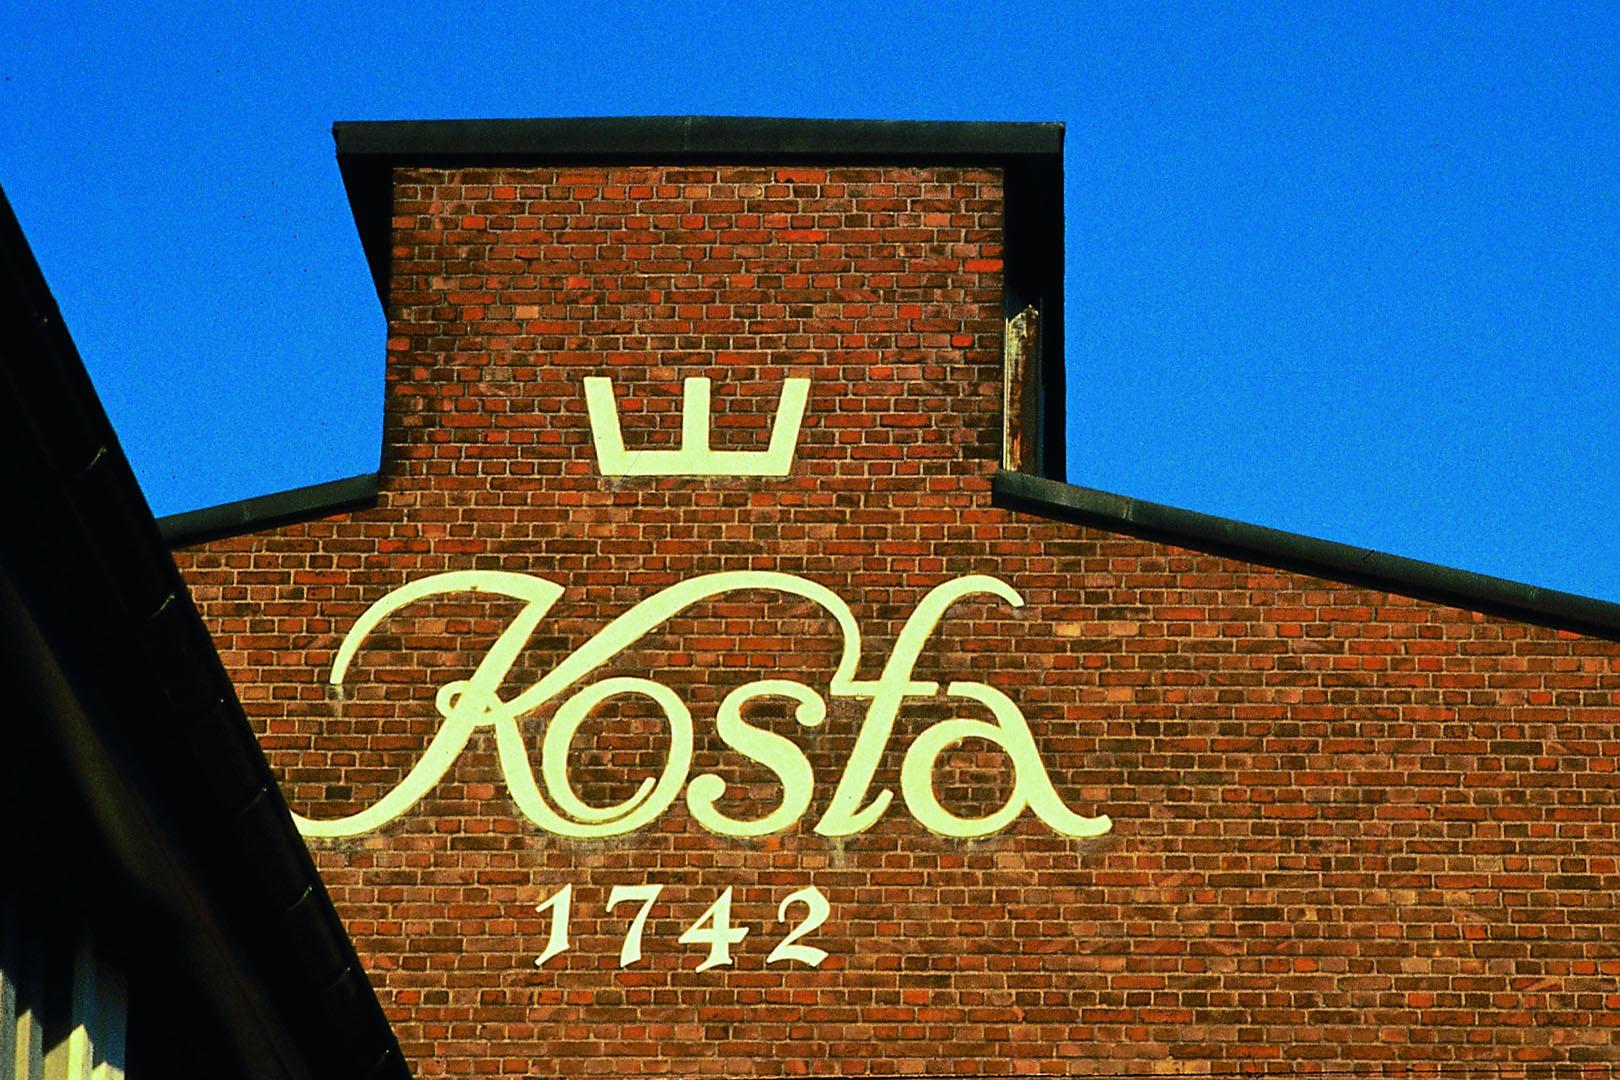 Kosta glassworks was founded in 1742